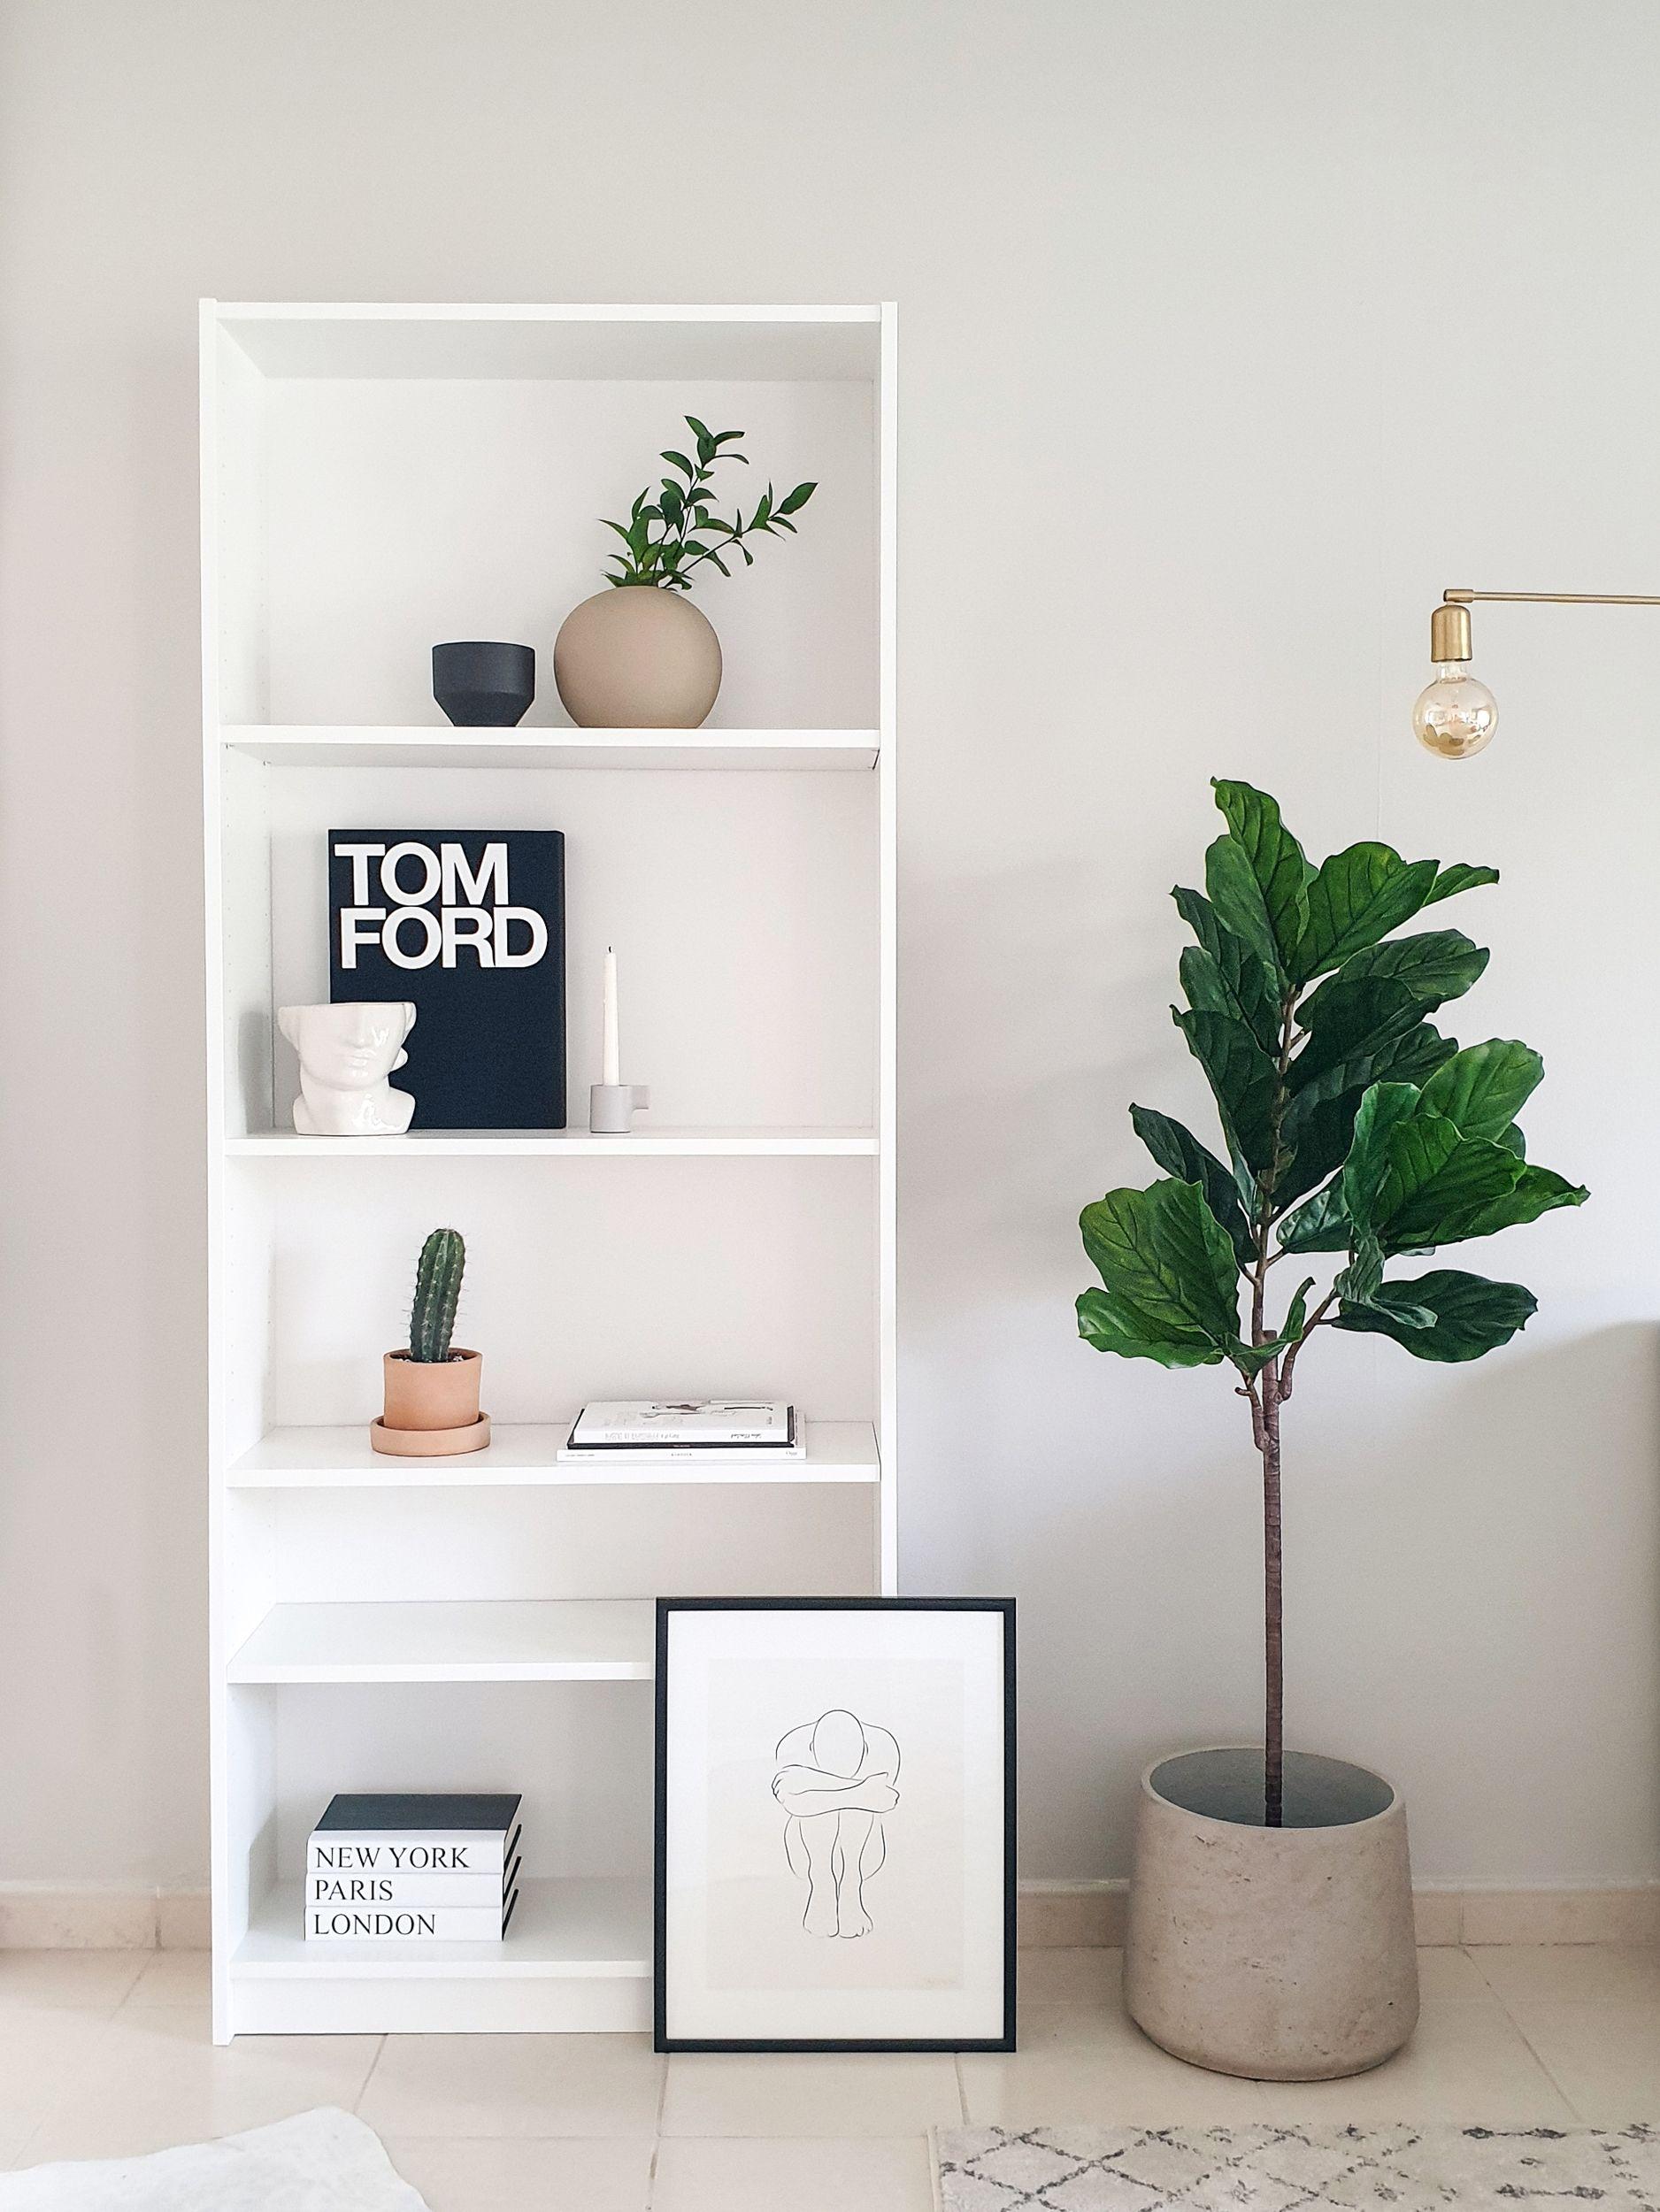 Ikea Billy Bookcase Hack In 2020 Inneneinrichtung Ideen